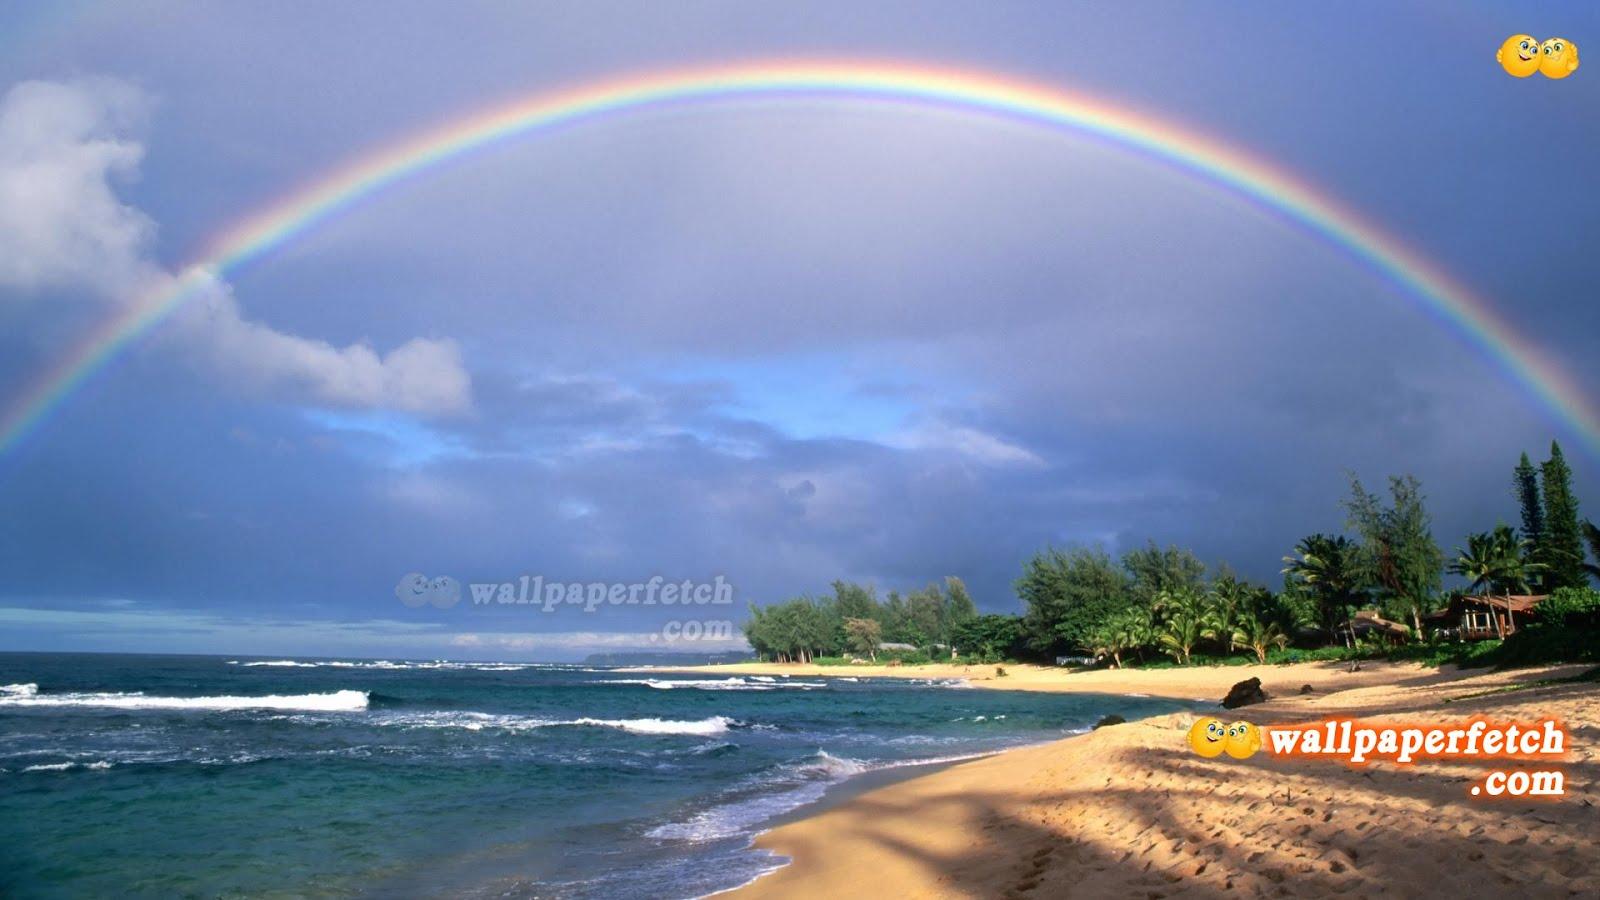 http://1.bp.blogspot.com/-590fxJorqEs/T6bZTpiKTPI/AAAAAAAALRY/xorB5GJB0dg/s1600/Rainbow_Over_Kauai_Hawaii_Wallpaper_1920x1080_wallpaperhere.jpg